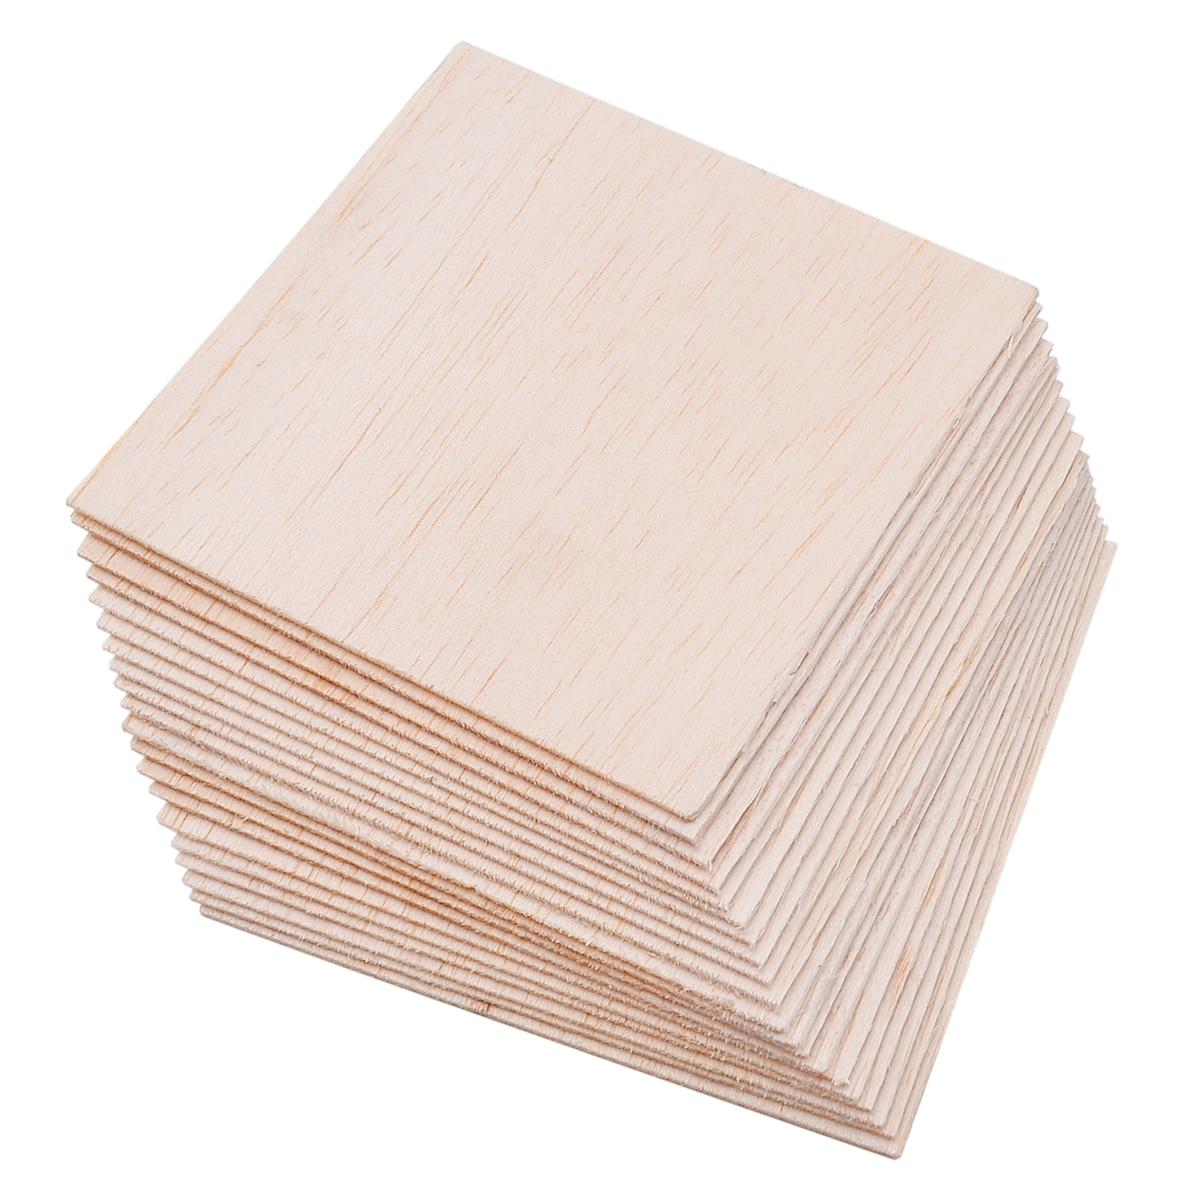 20pcs/set Balsa Wood Sheets Wooden Plate Model For DIY House Ship Aircraft 100x100x1mm20pcs/set Balsa Wood Sheets Wooden Plate Model For DIY House Ship Aircraft 100x100x1mm